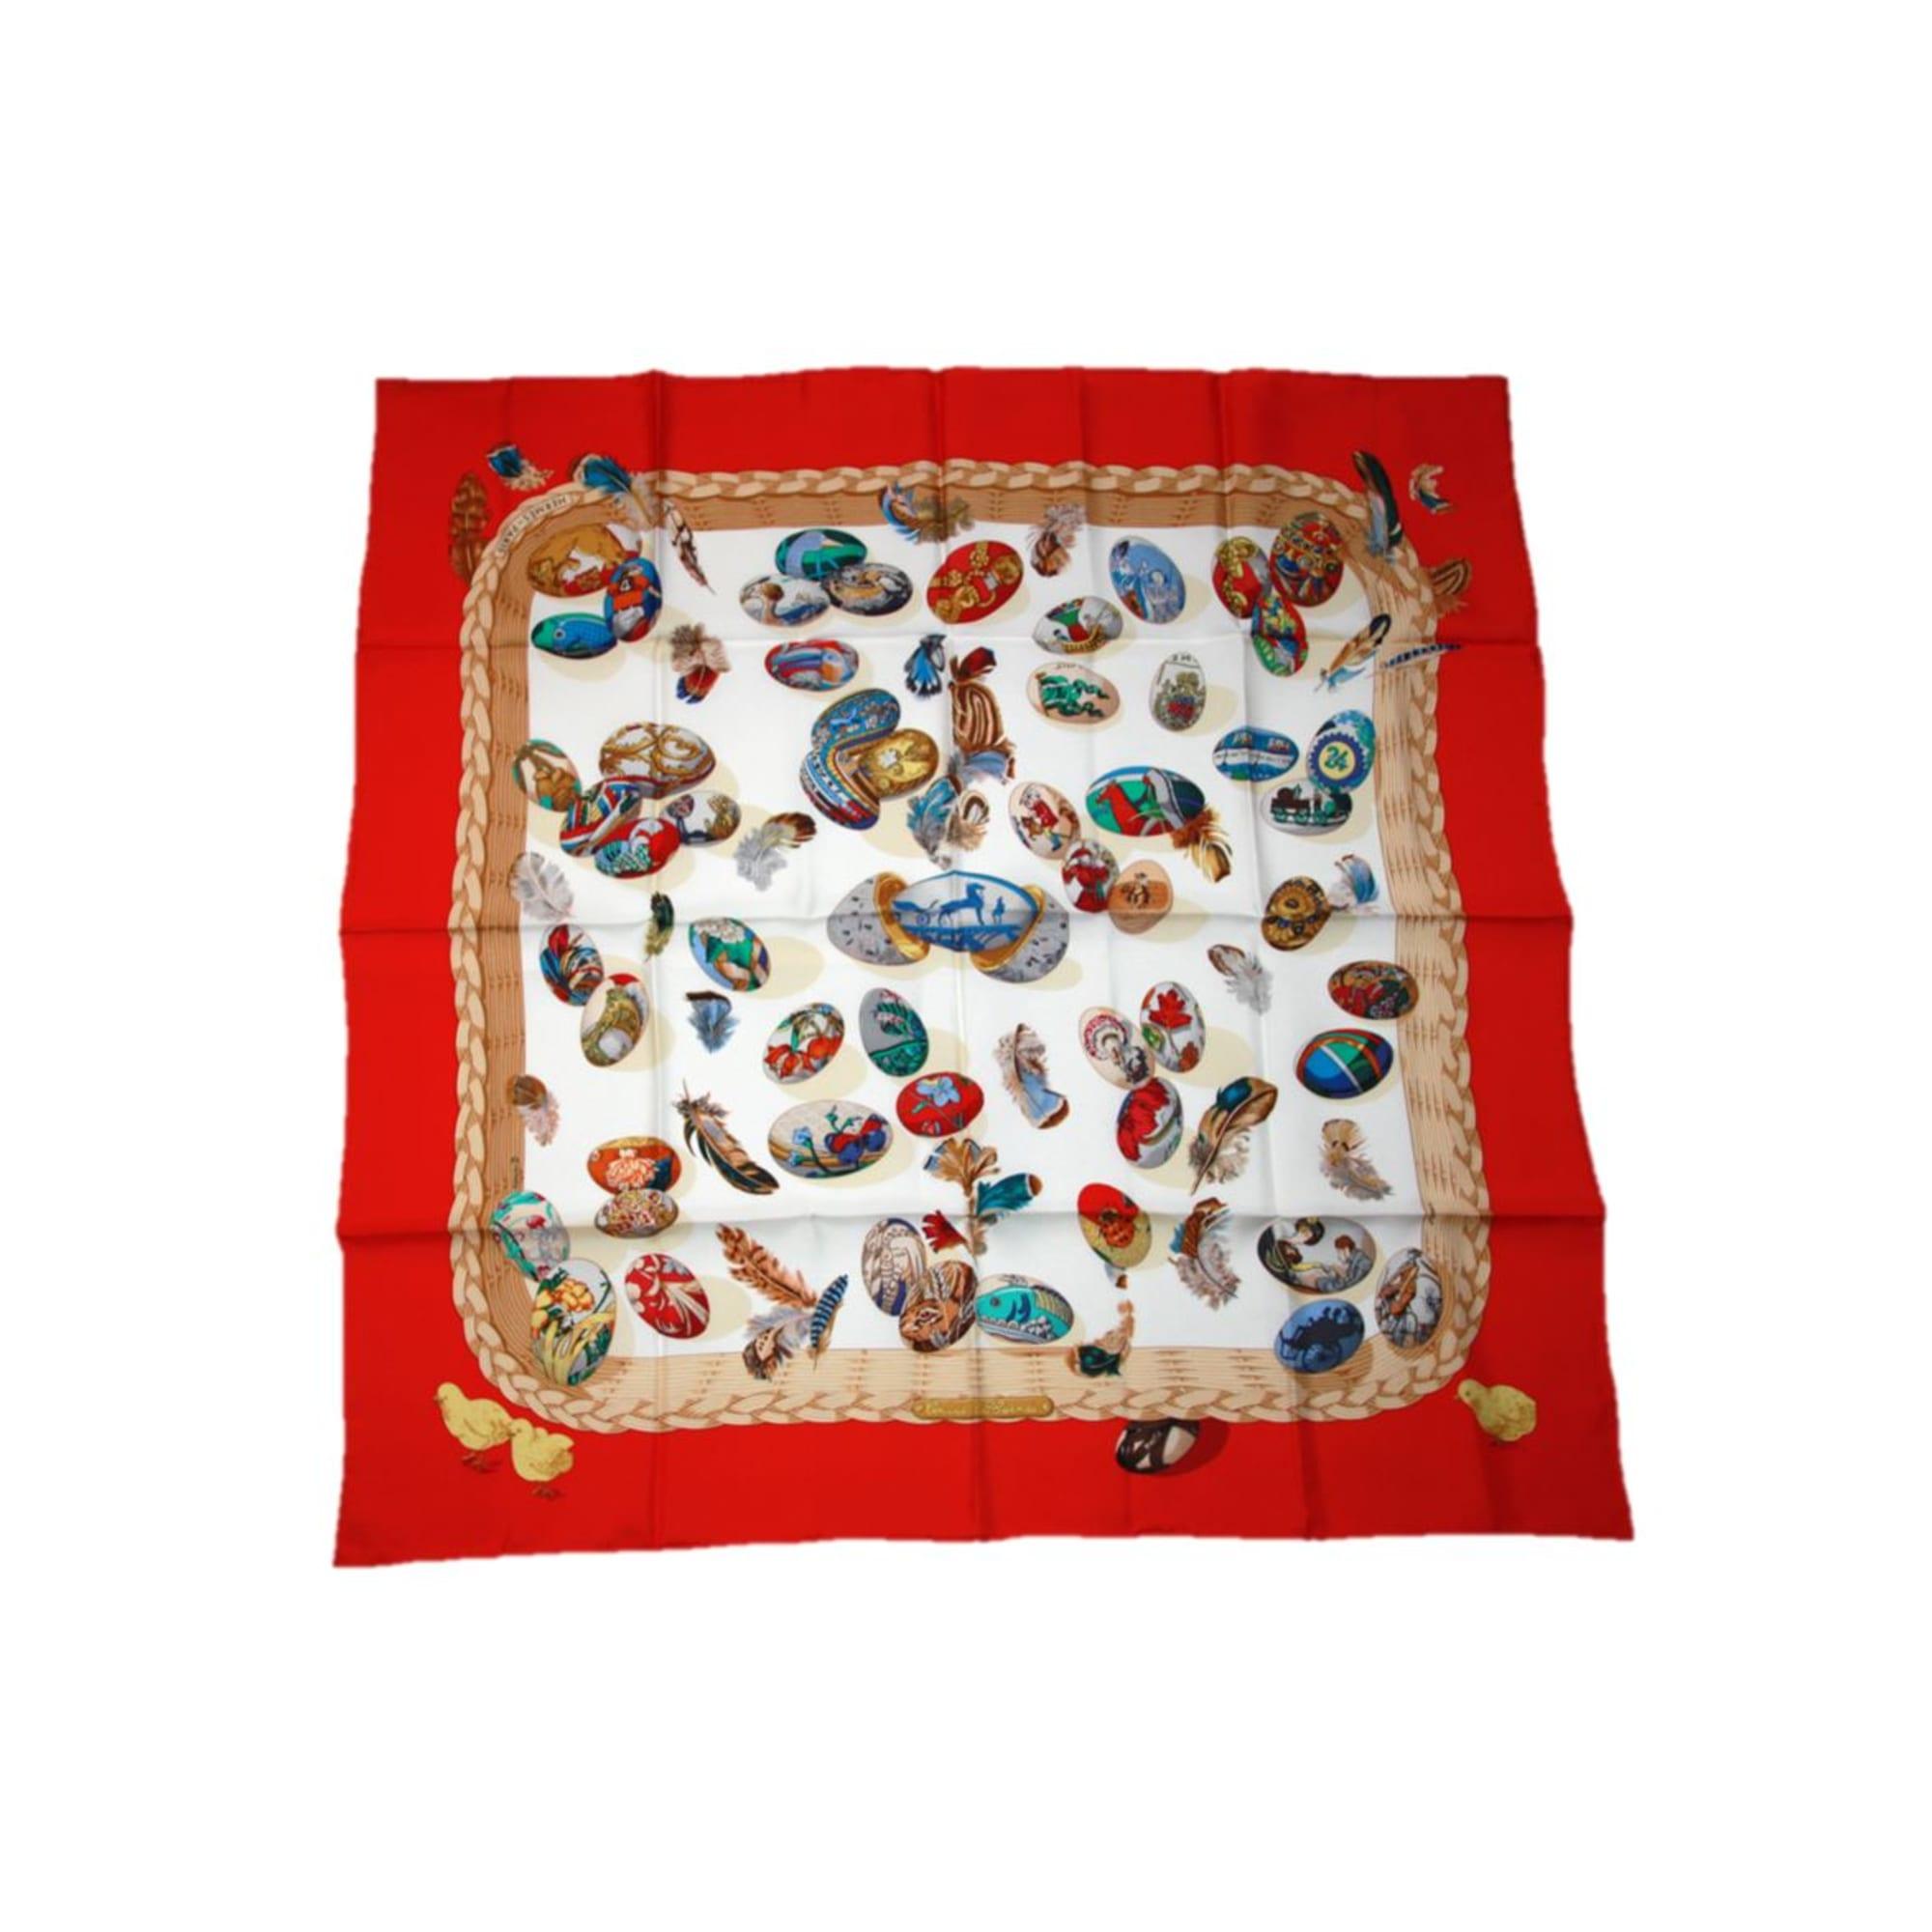 c16578c9841 Foulard HERMÈS rouge - 7501323